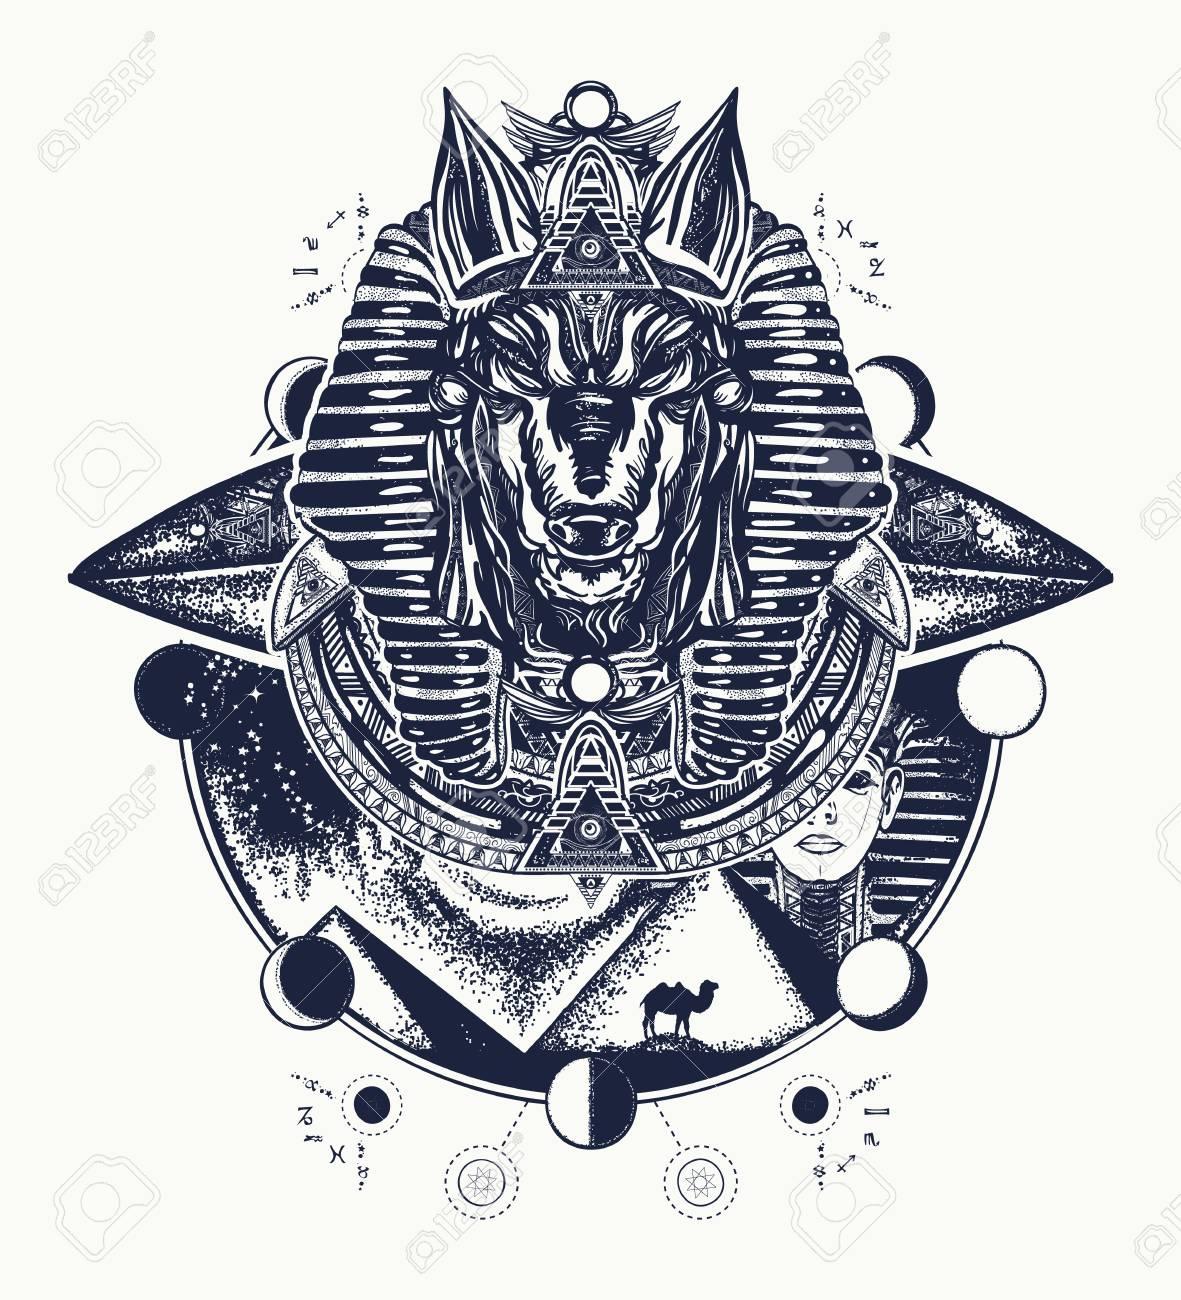 Diseño De Tatuaje Y Camiseta De Anubis Anubis Dios De La Guerra